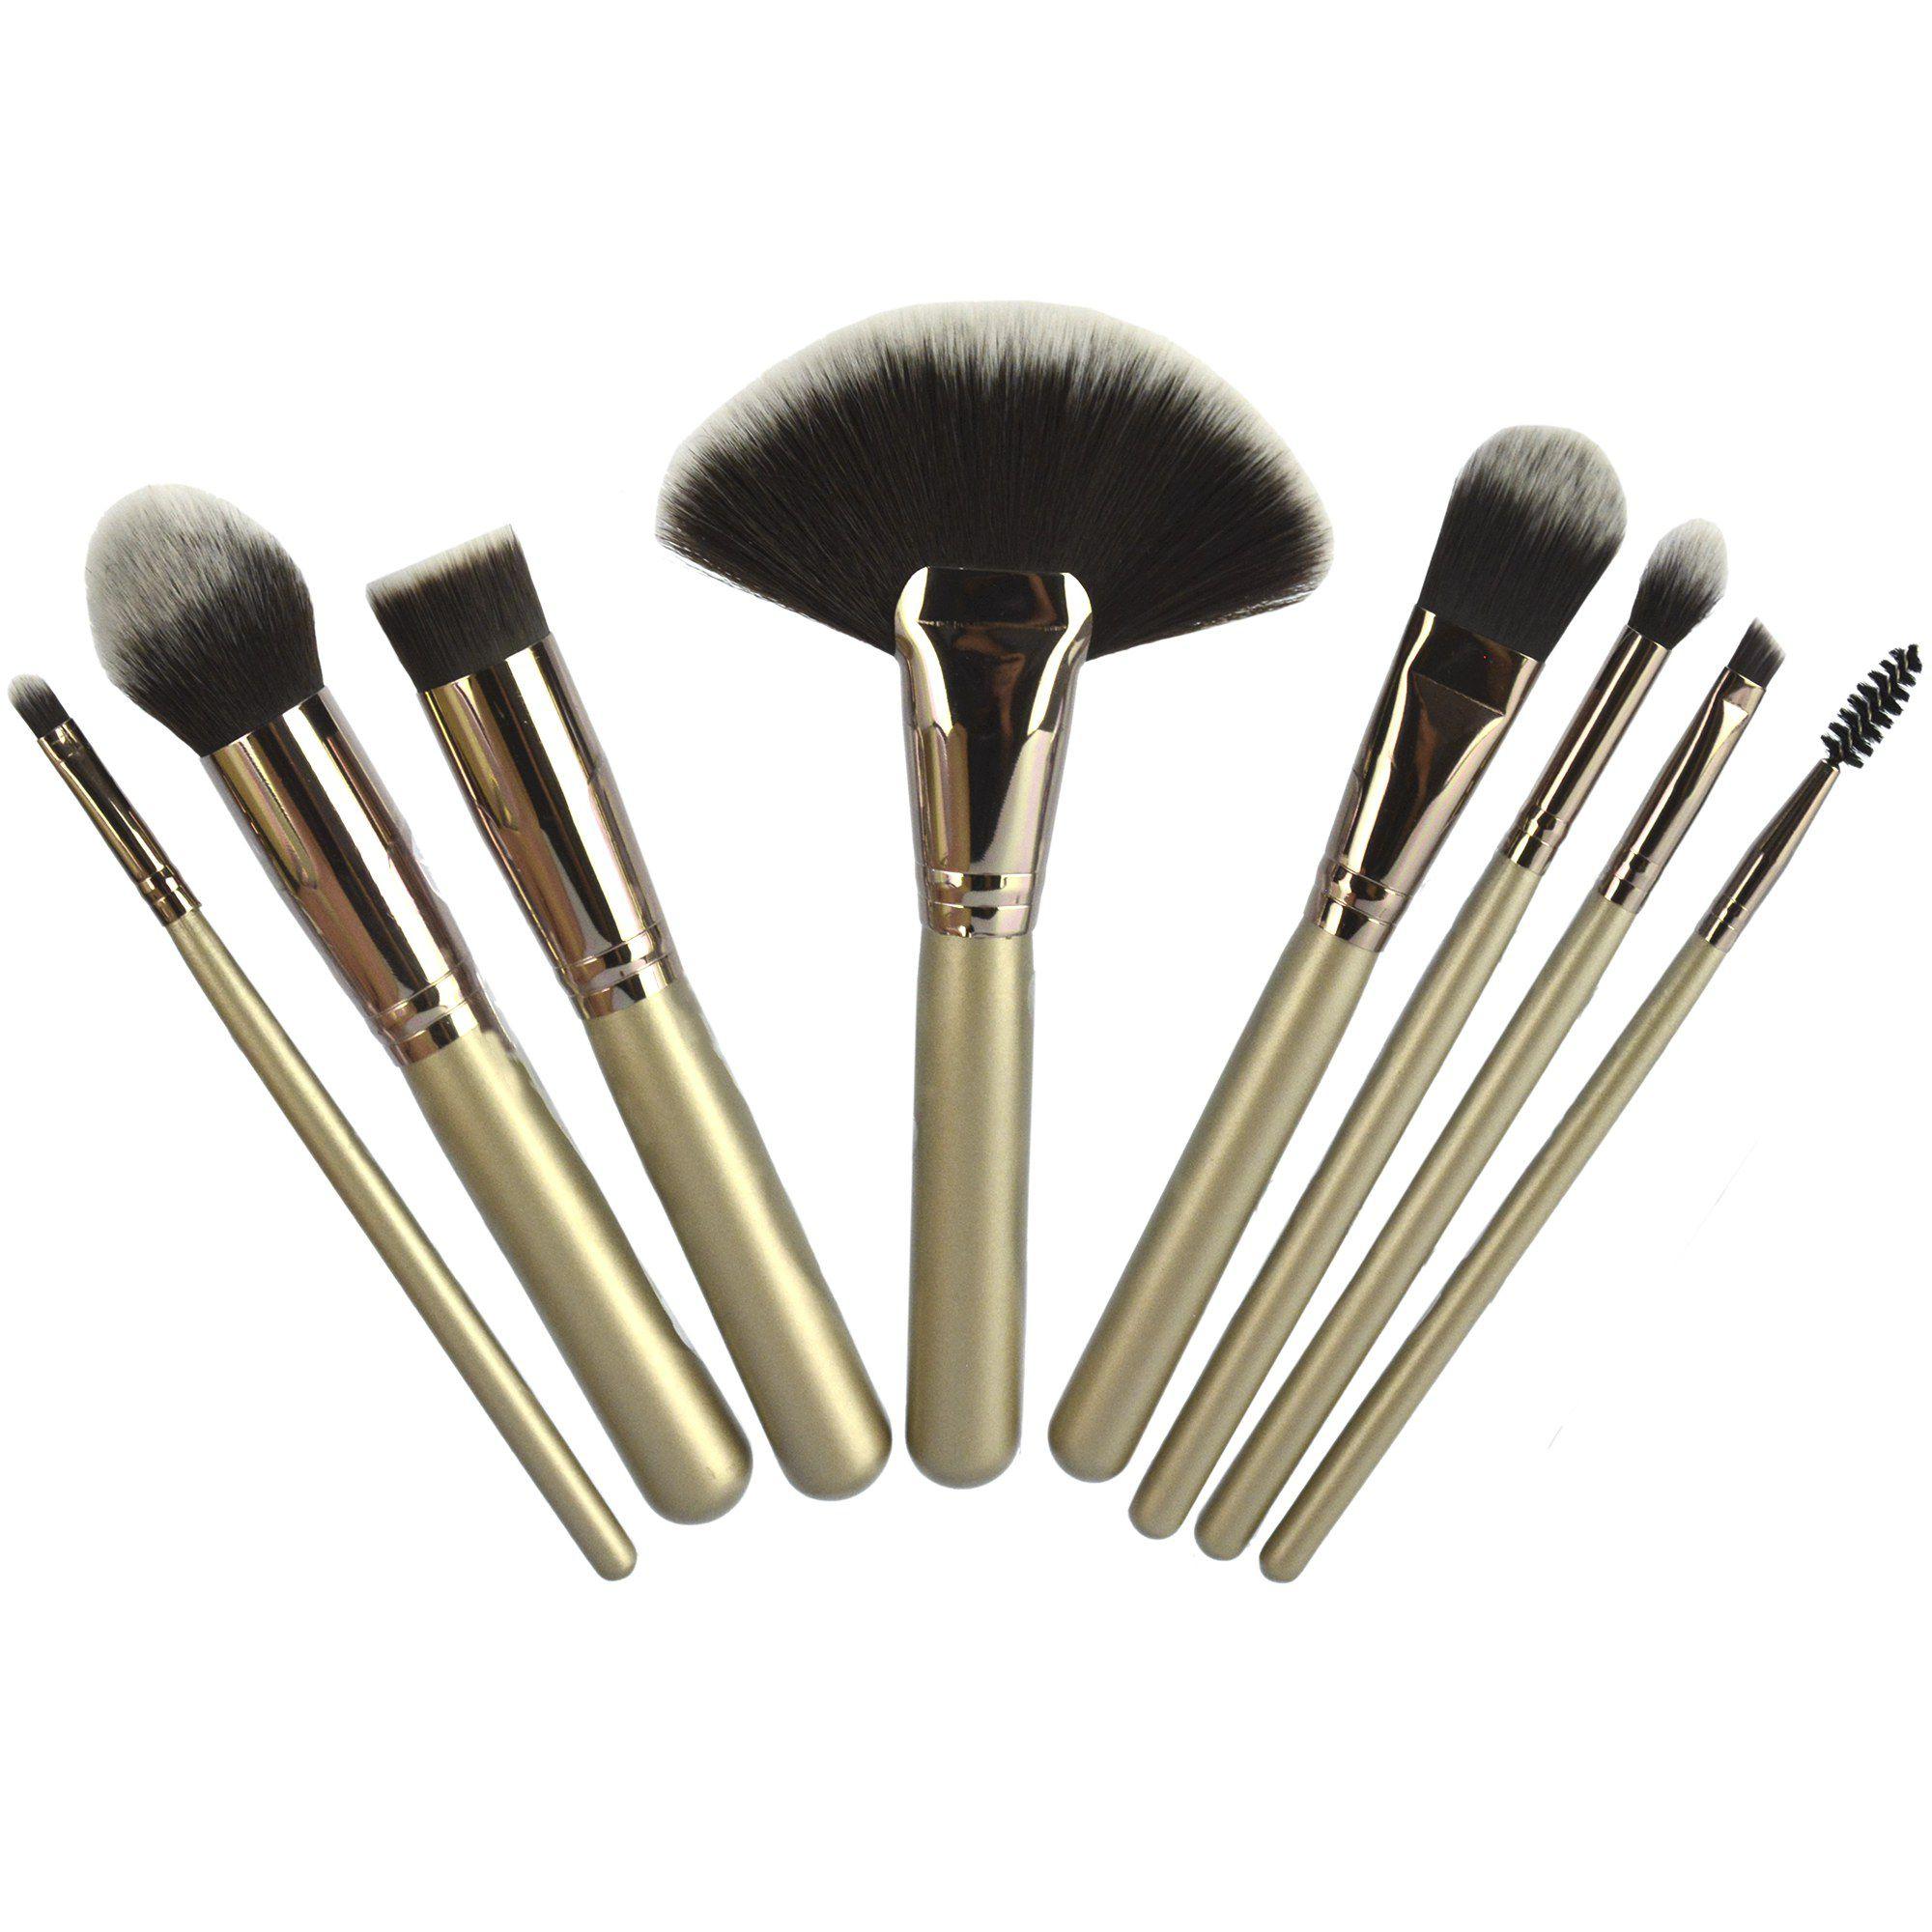 Kit 8 Pincéis Para Maquiagem Luxo Prata CBRN11025